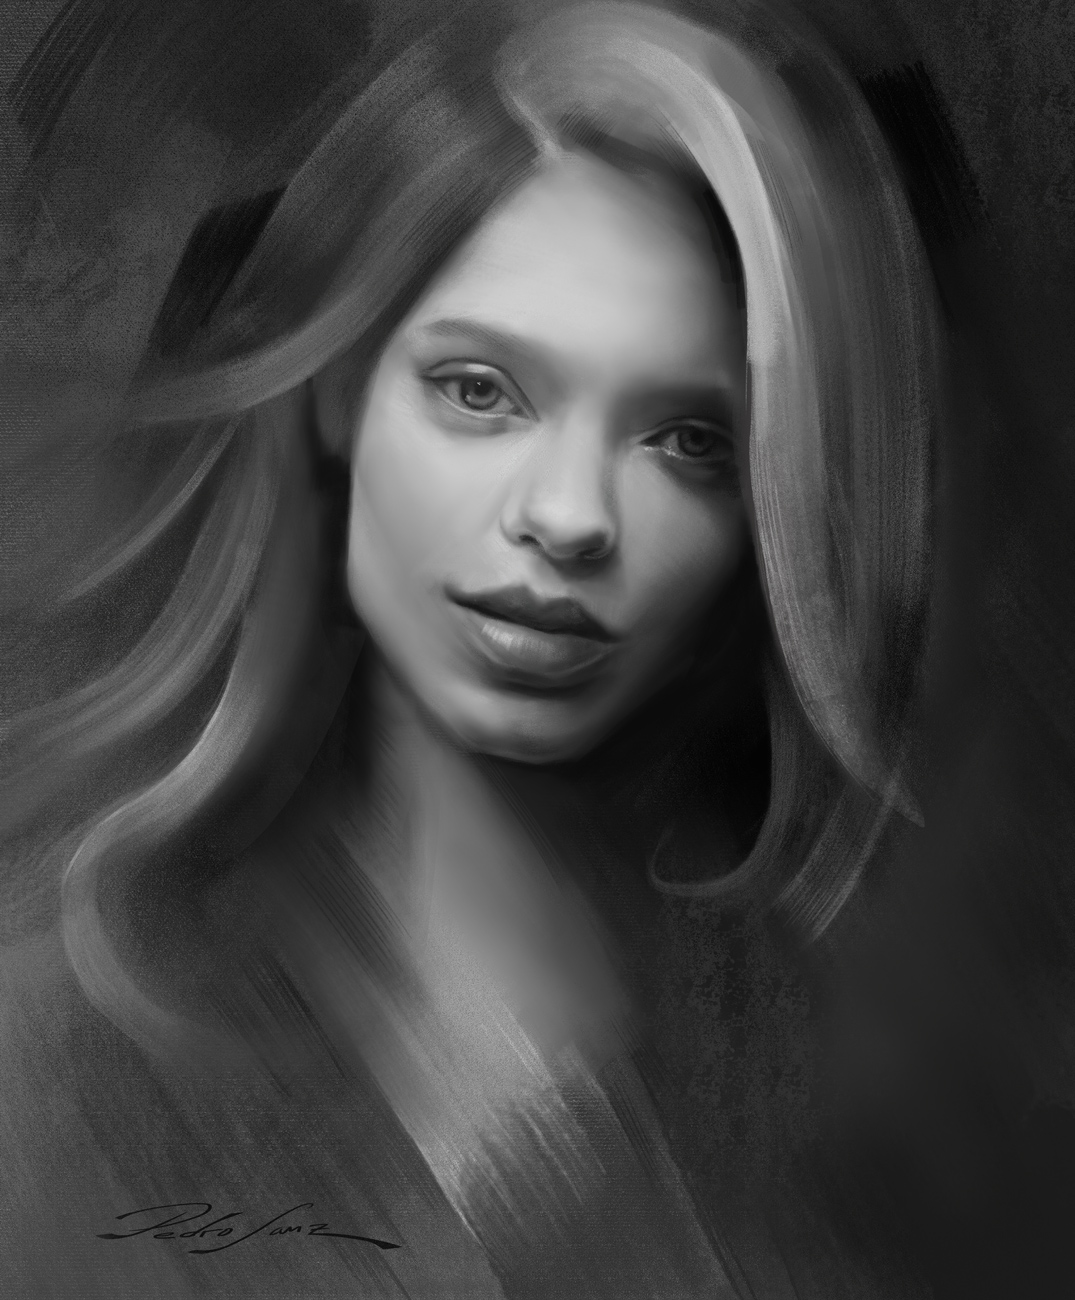 Portrait drawing Nov 2018